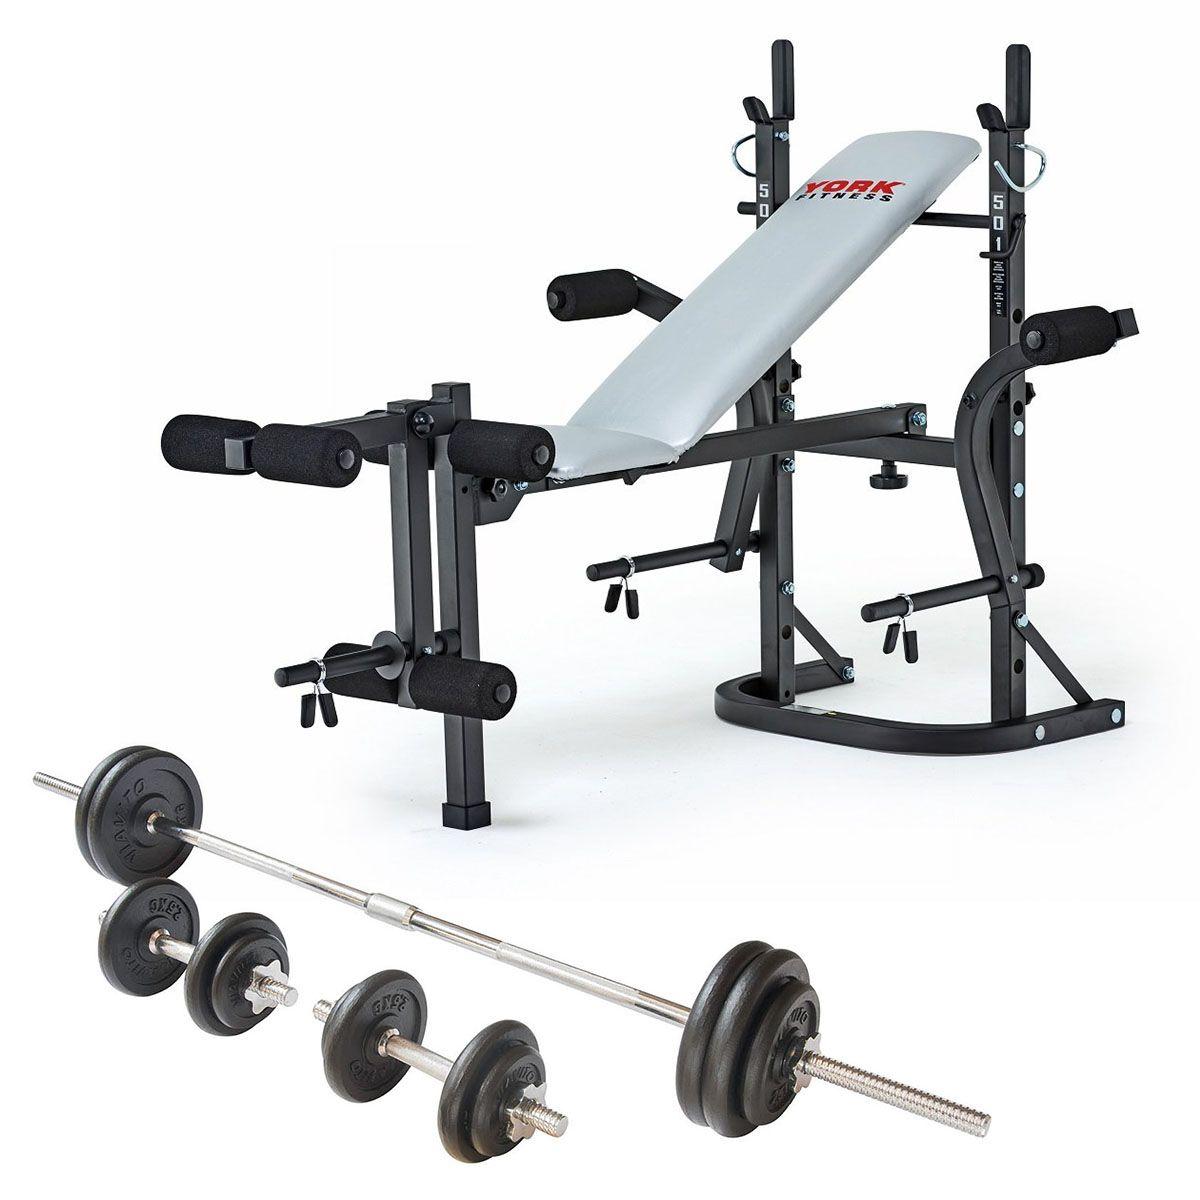 York B501 Weight Bench And Viavito 50kg Cast Iron Weight Set